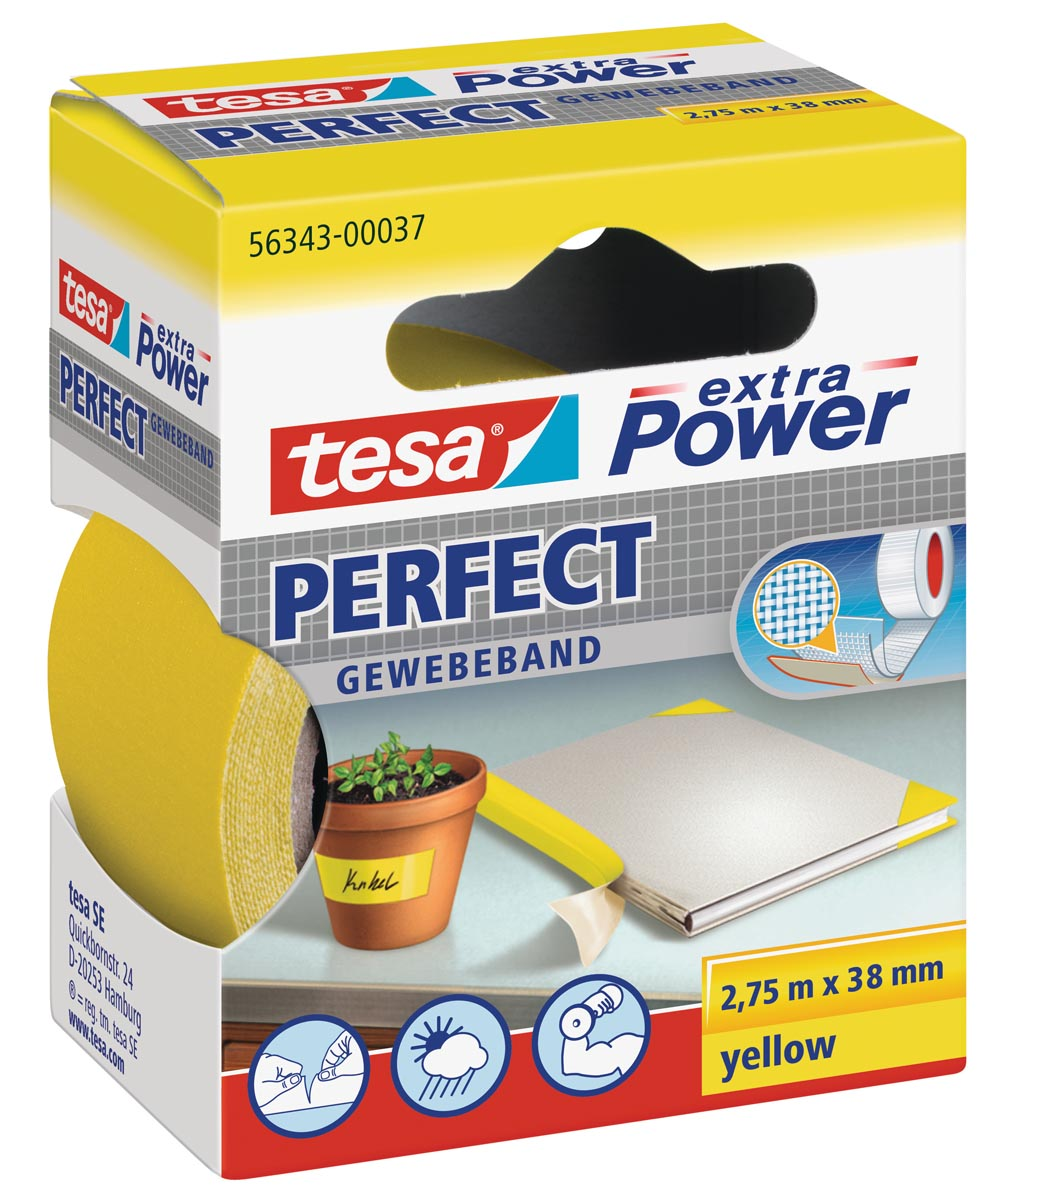 Tesa extra Power Pefect, ft 38 mm x 2,75 m, geel